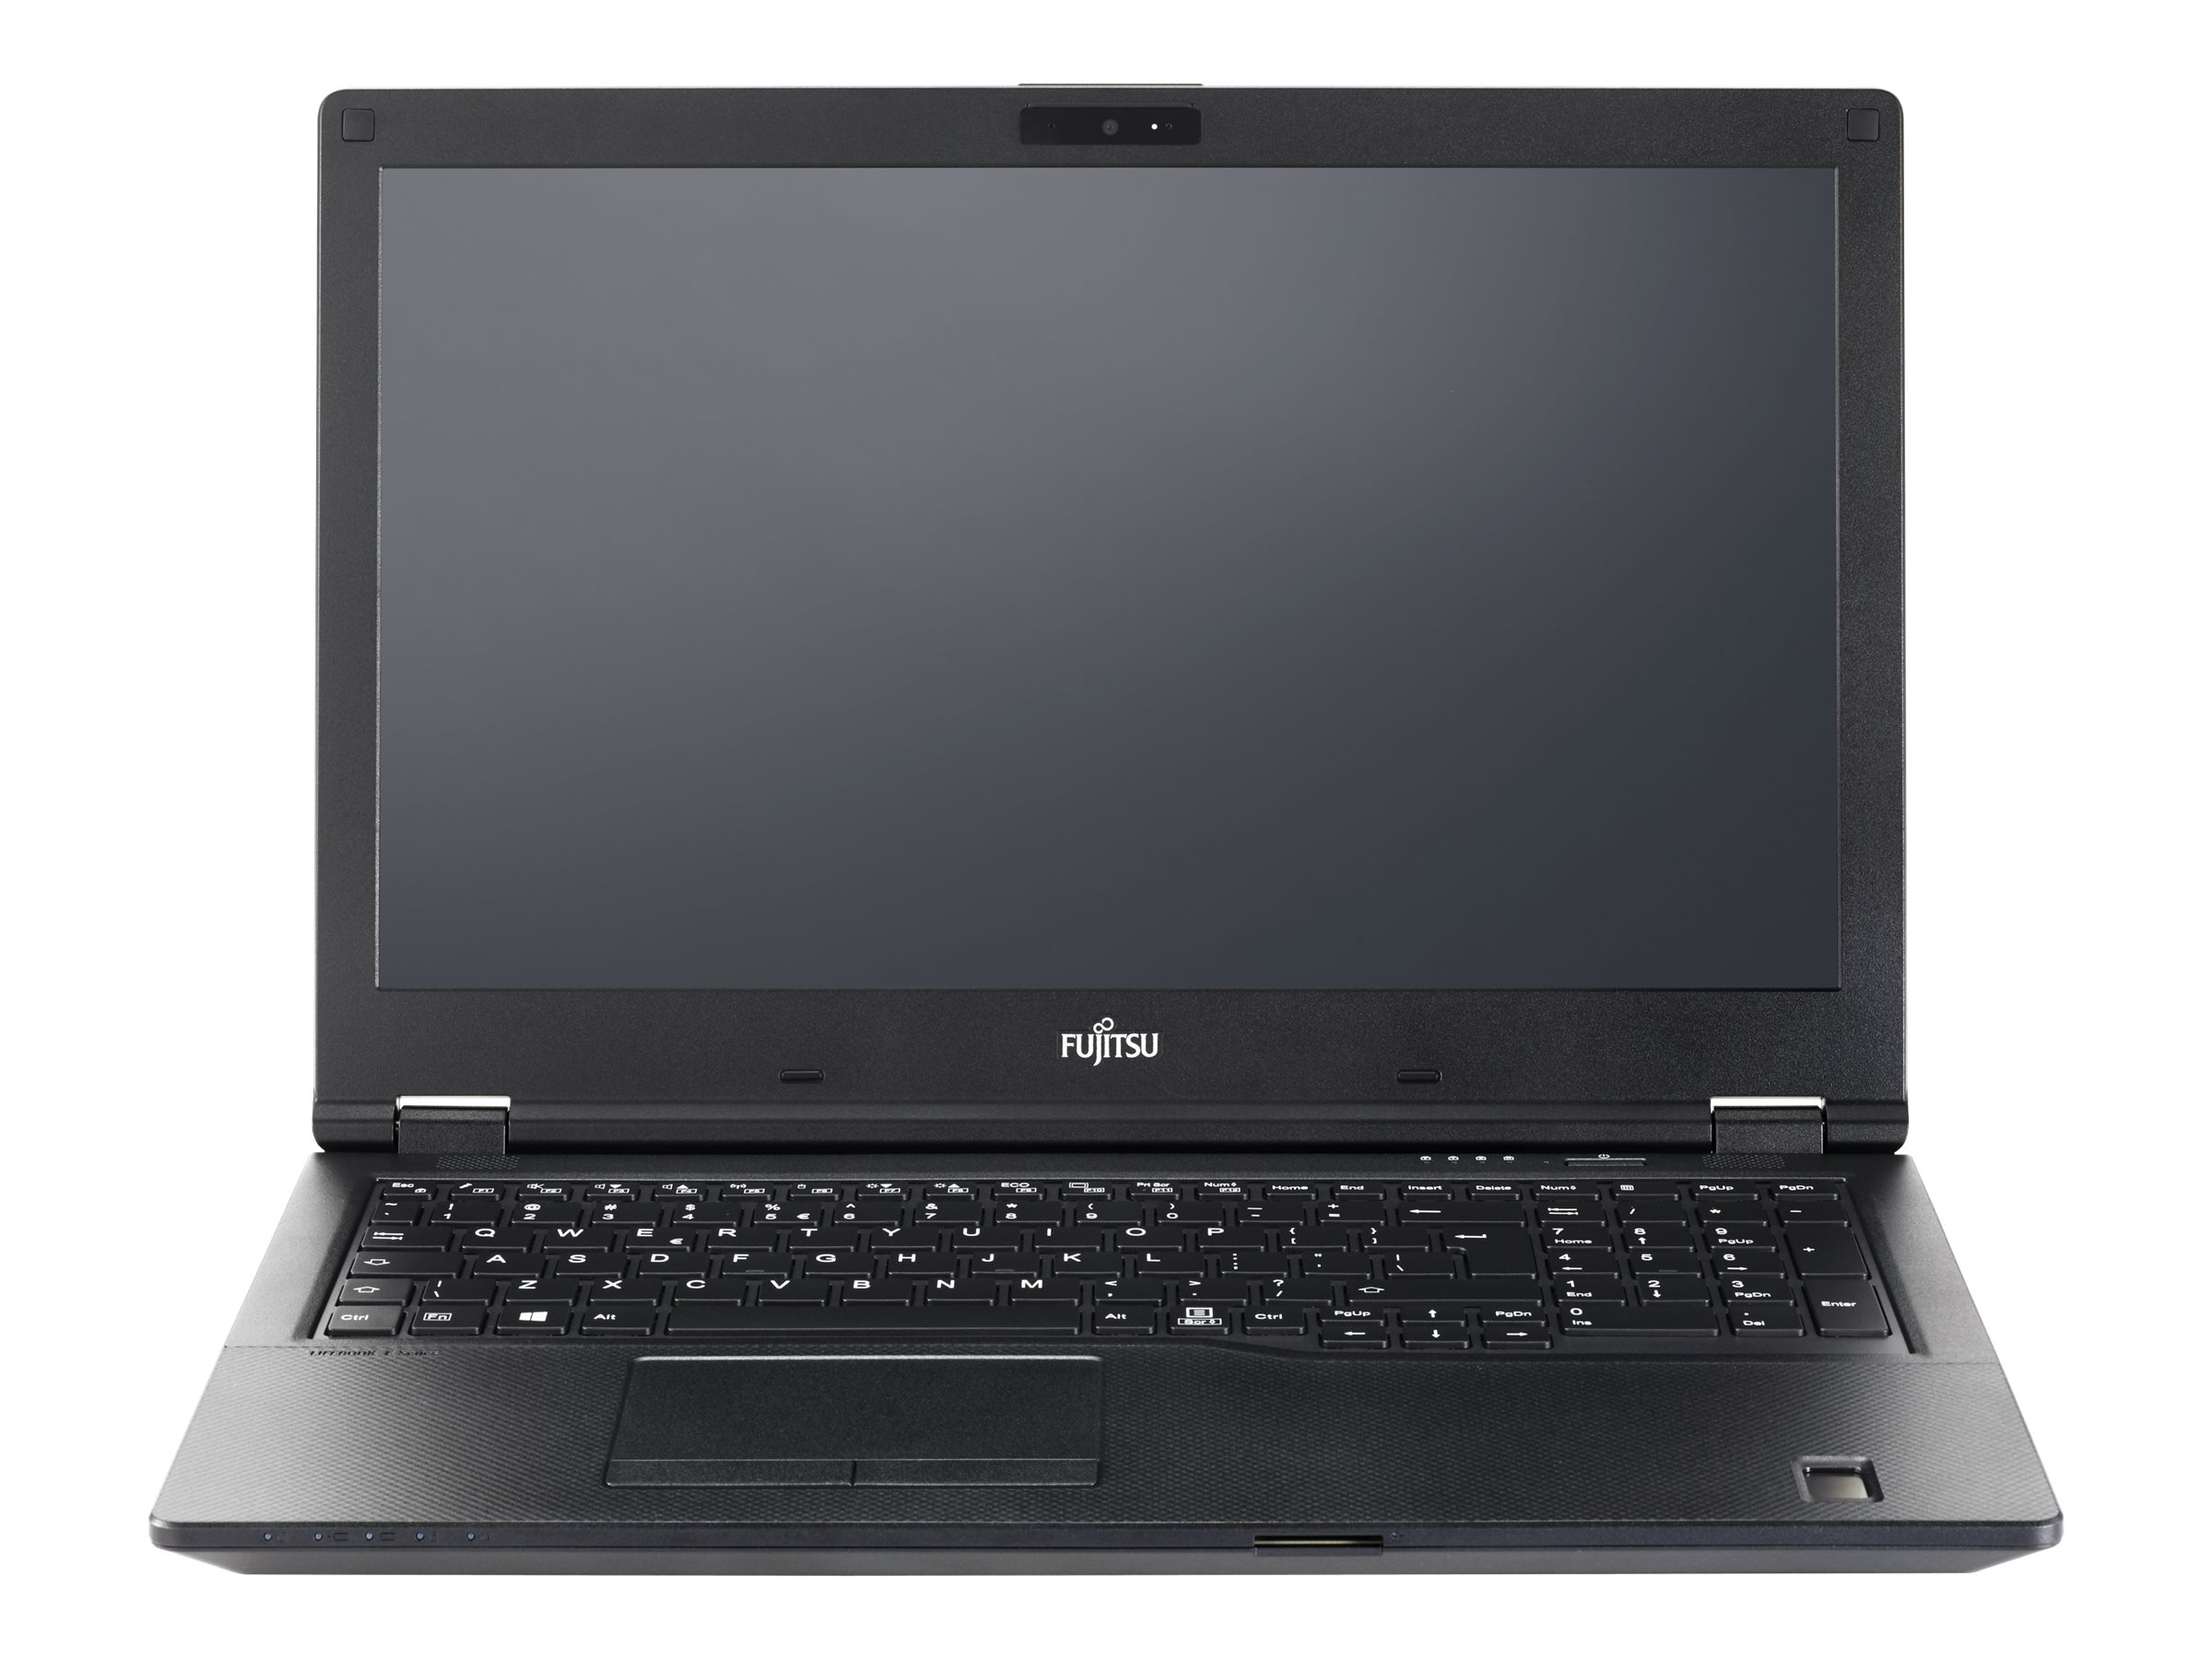 "Fujitsu LIFEBOOK E459 - Core i5 8250U / 1.6 GHz - Win 10 Pro - 8 GB RAM - 256 GB SSD SED, TCG Opal Encryption, NVMe - 39.6 cm (15.6"")"